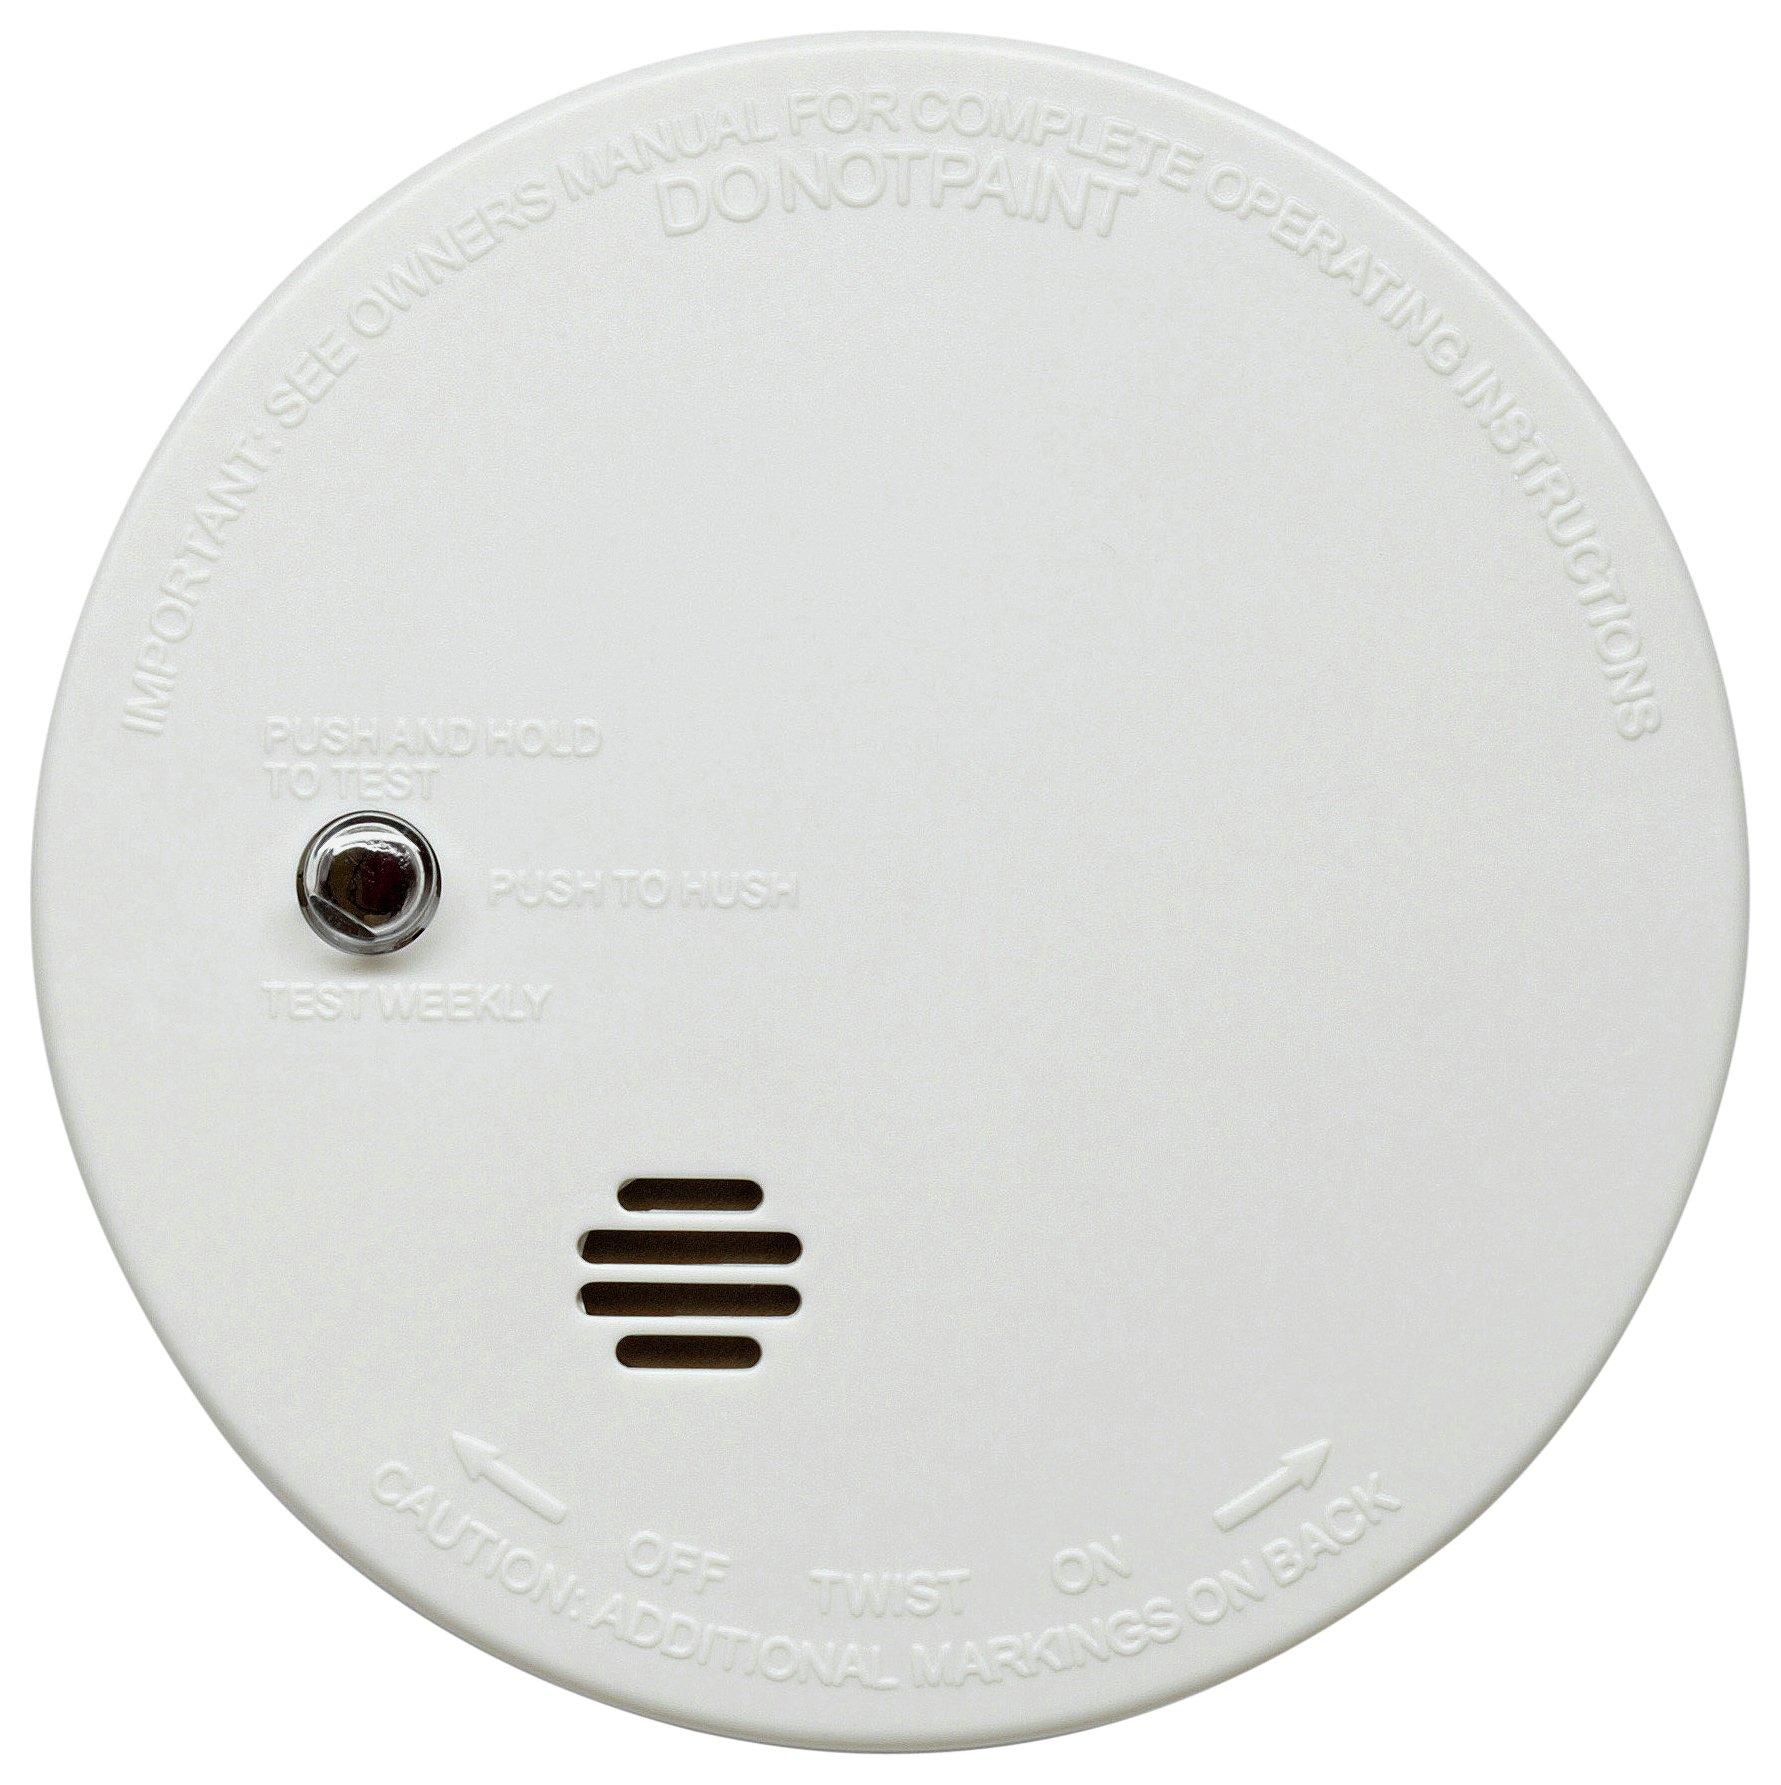 Lifesaver Micro Smoke Alarm